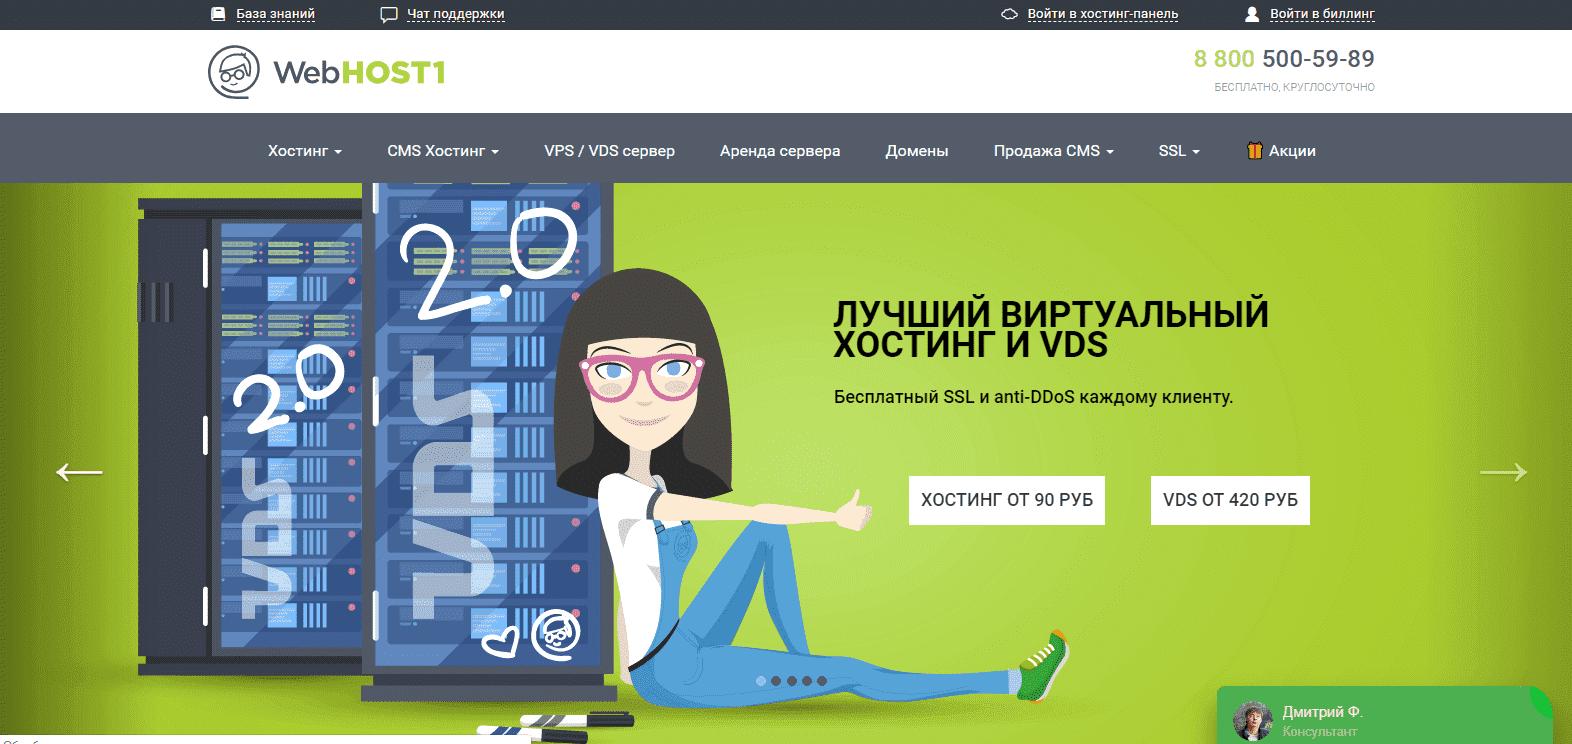 Webhost1 хостинг хостинг в иркутске